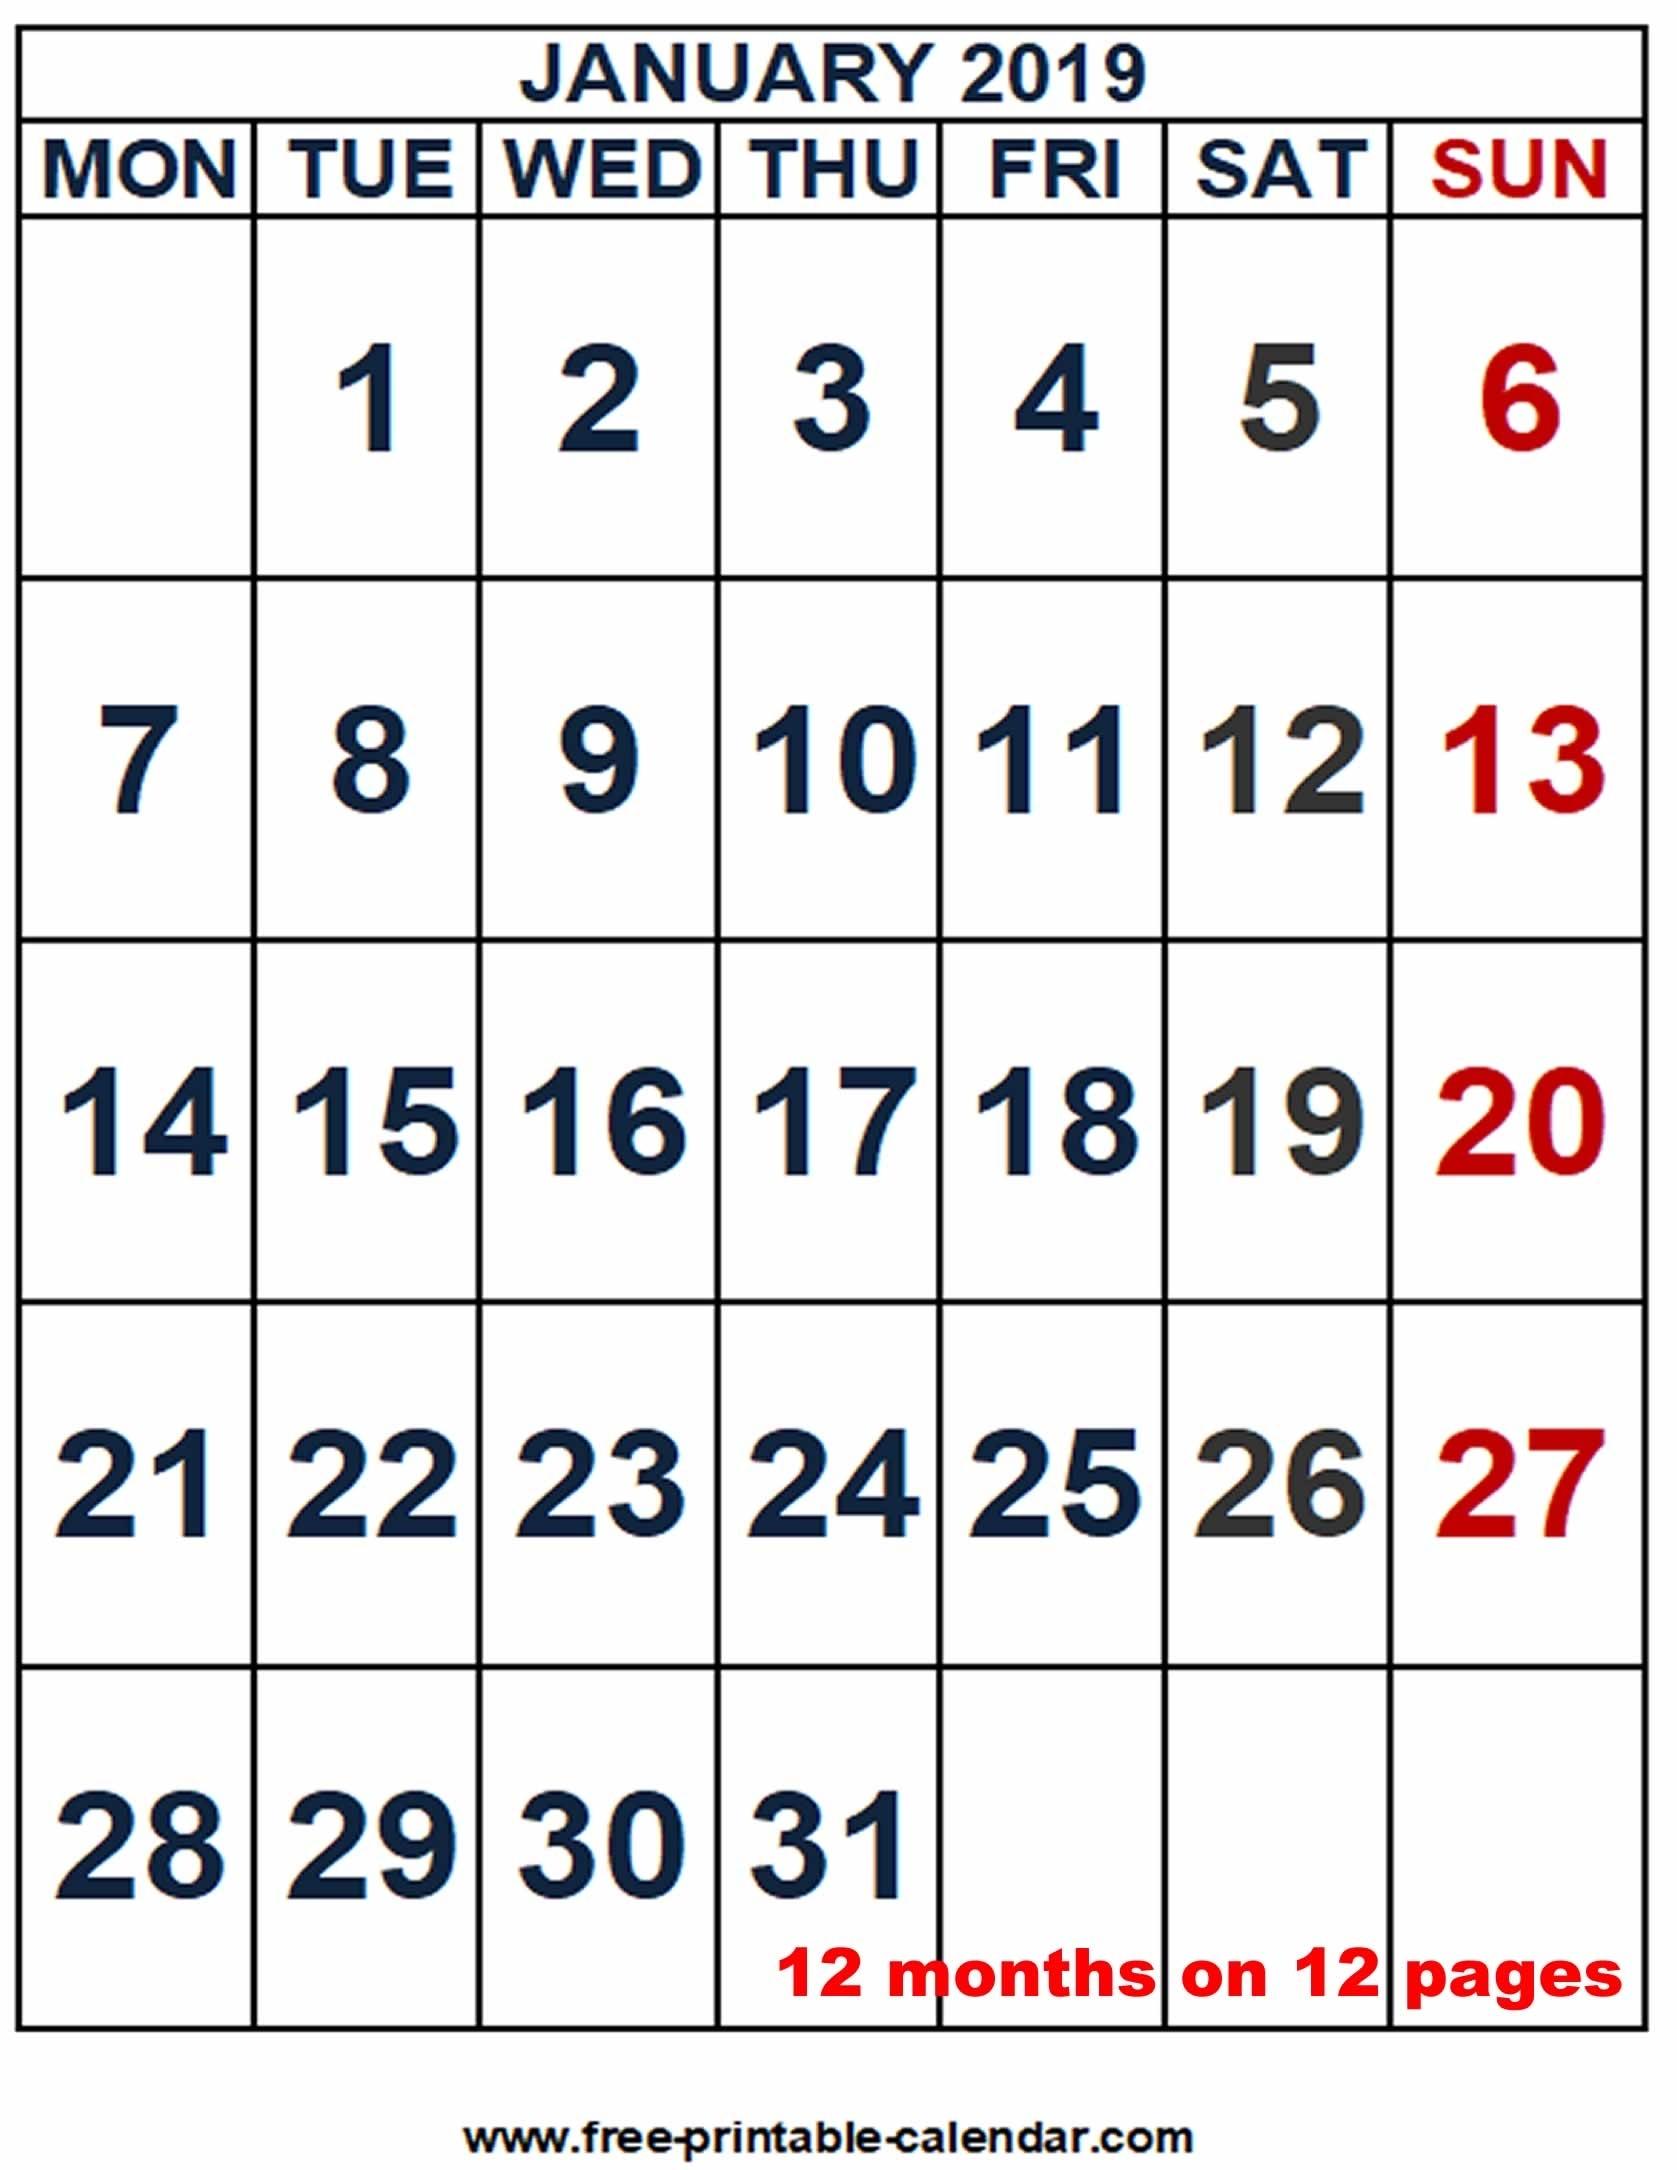 2019 Calendar Word Template - Free-Printable-Calendar